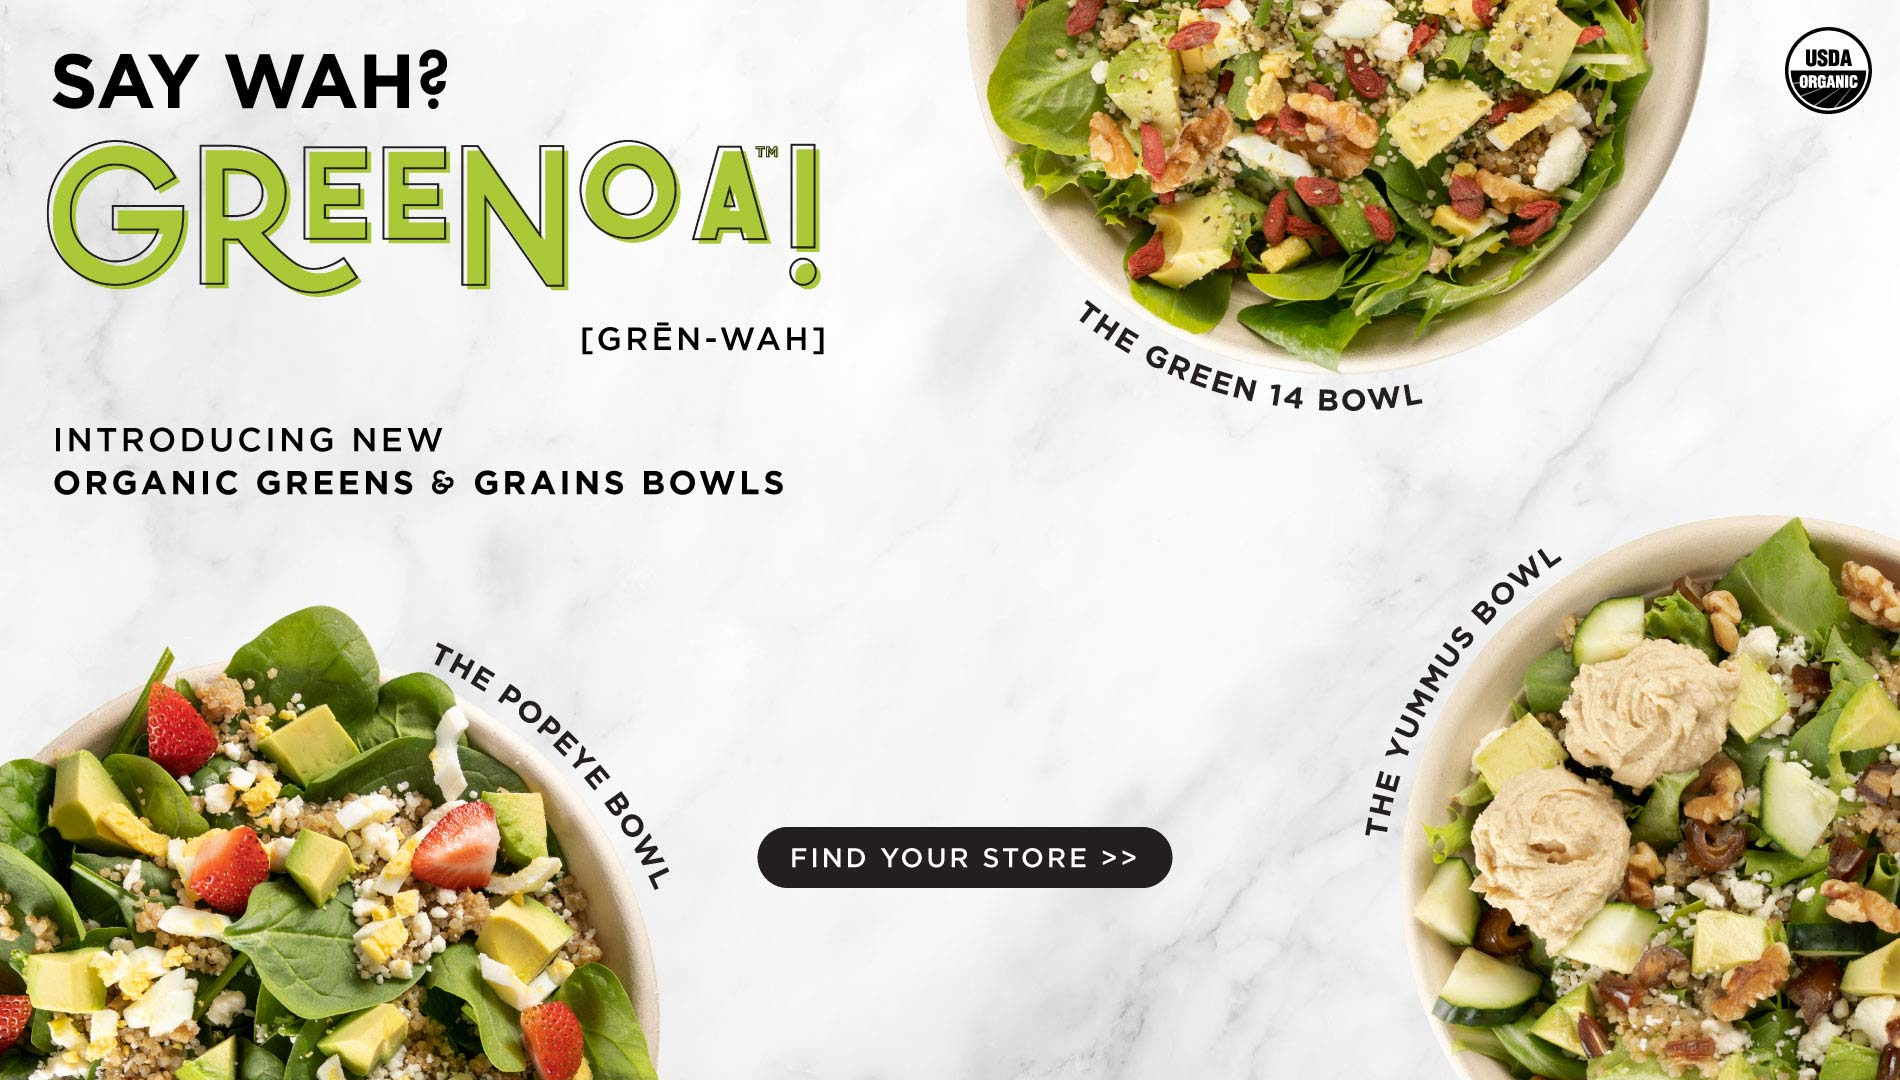 Greenoa Bowls